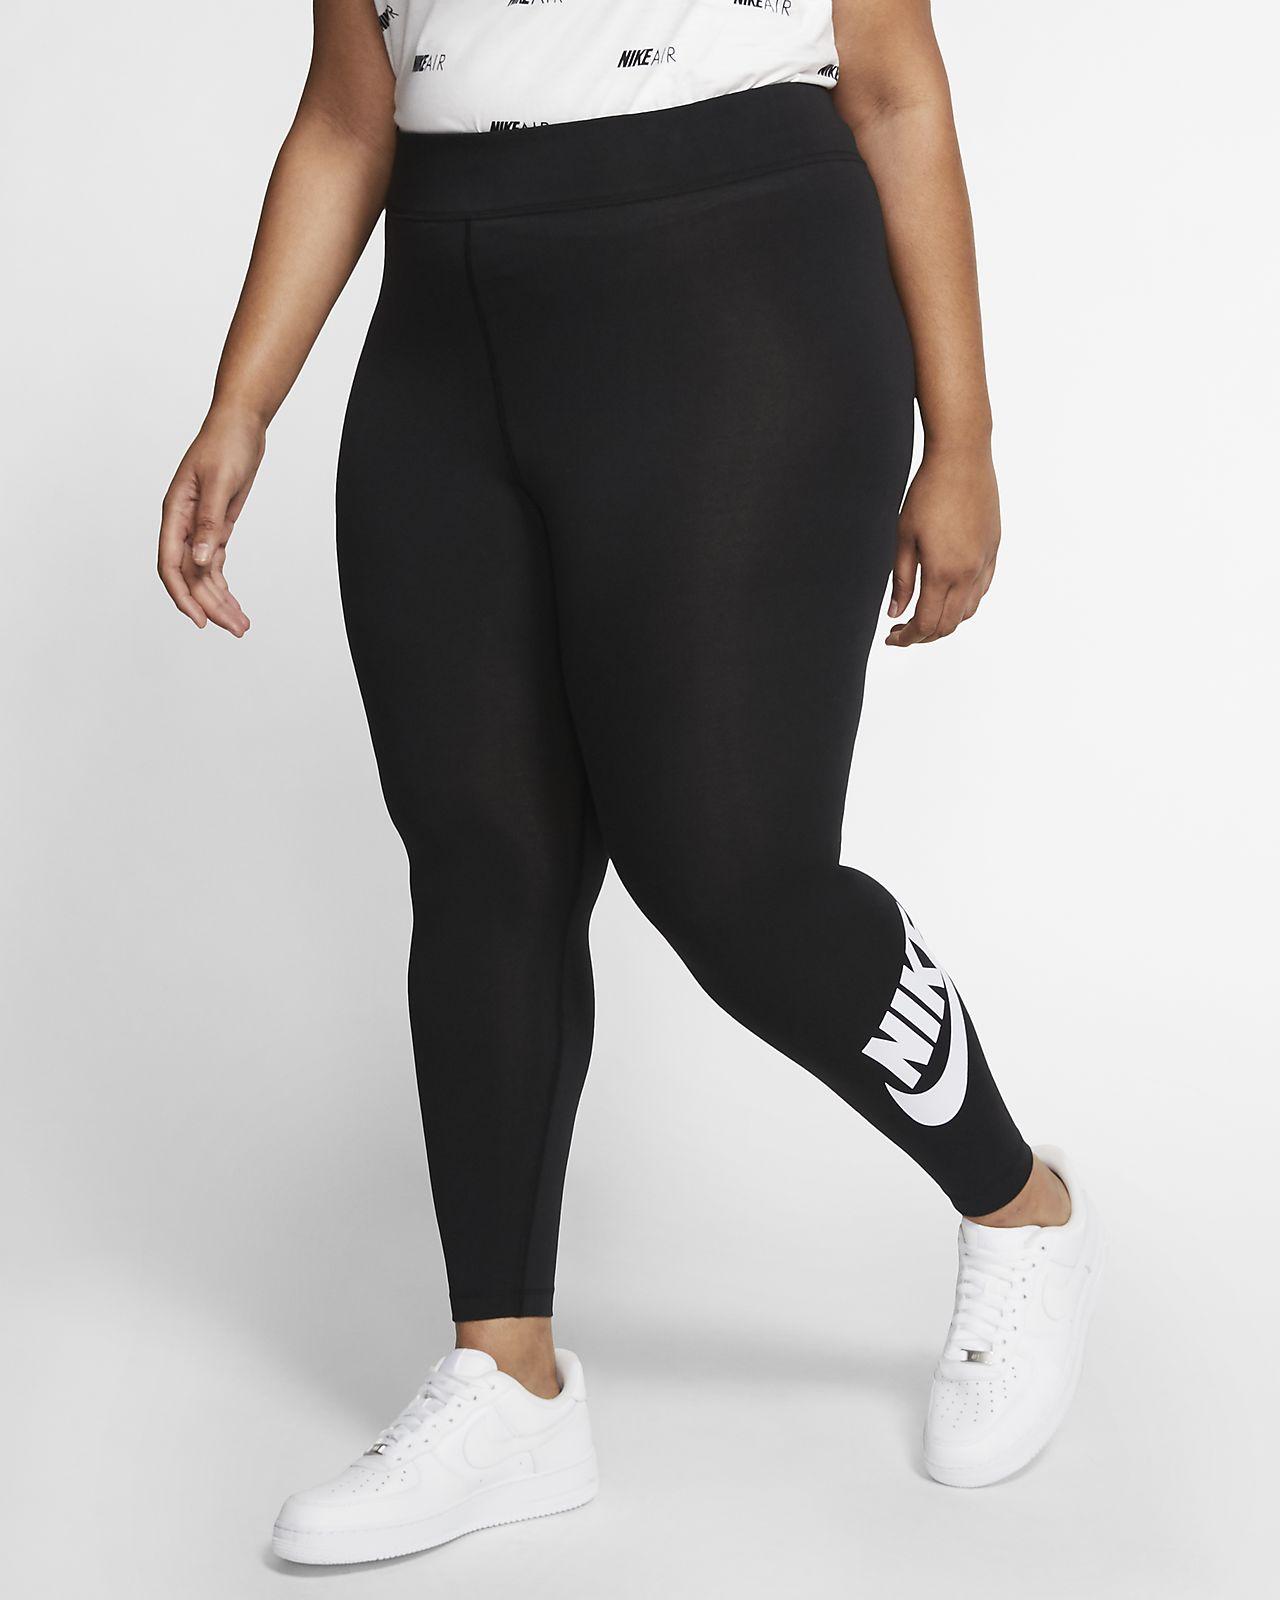 Nike Sportswear Leg-A-See magas derekú női leggings (plus size méret)